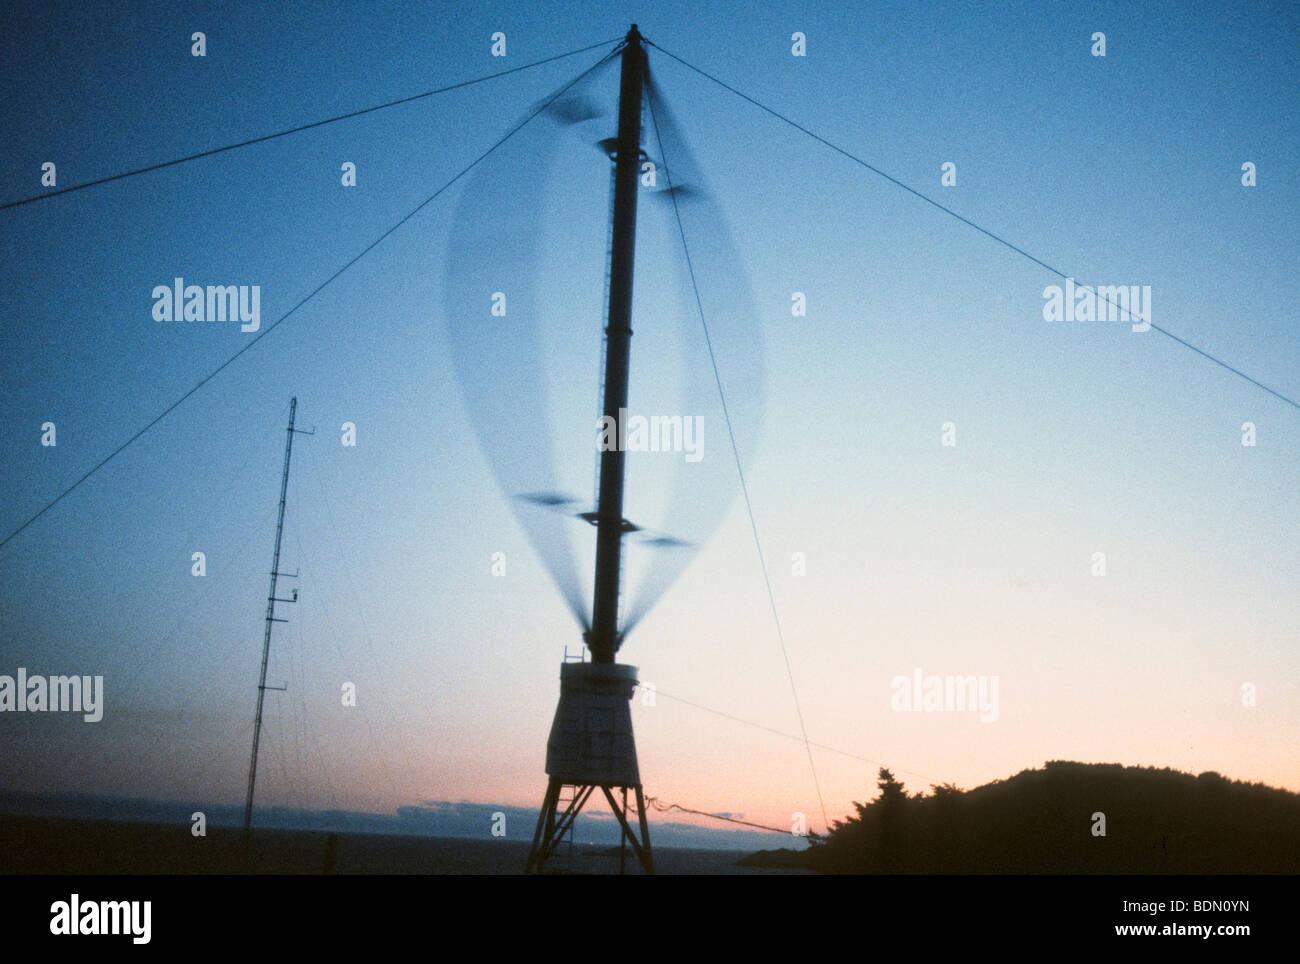 Wind Turbine, Wind mill eggbeater shape in British Columbia, Canada at sunset - Stock Image